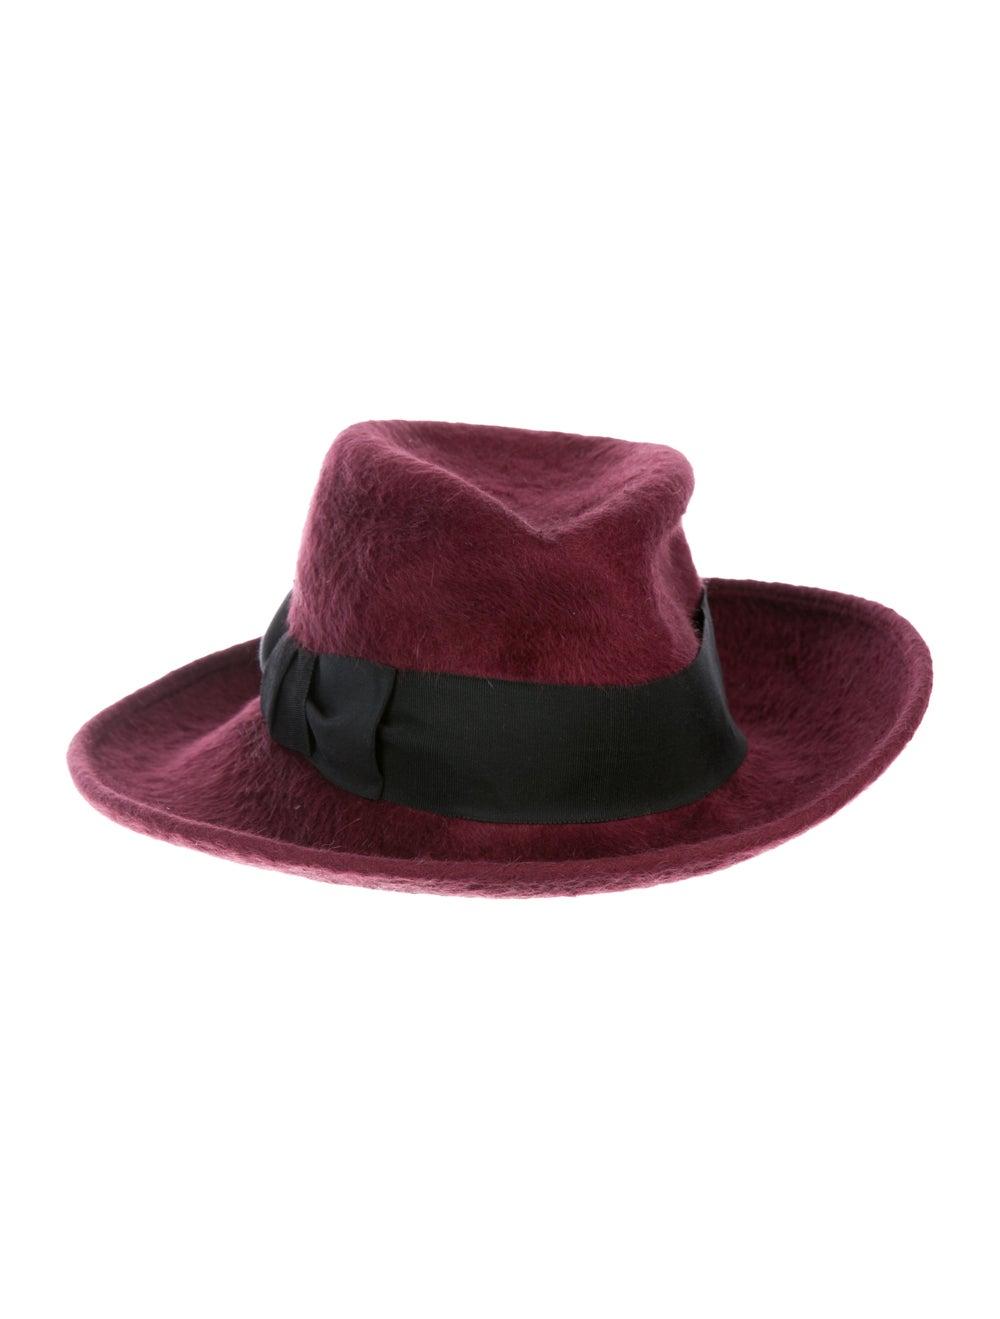 Eric Javits Wide-Brim Felt Hat - image 2